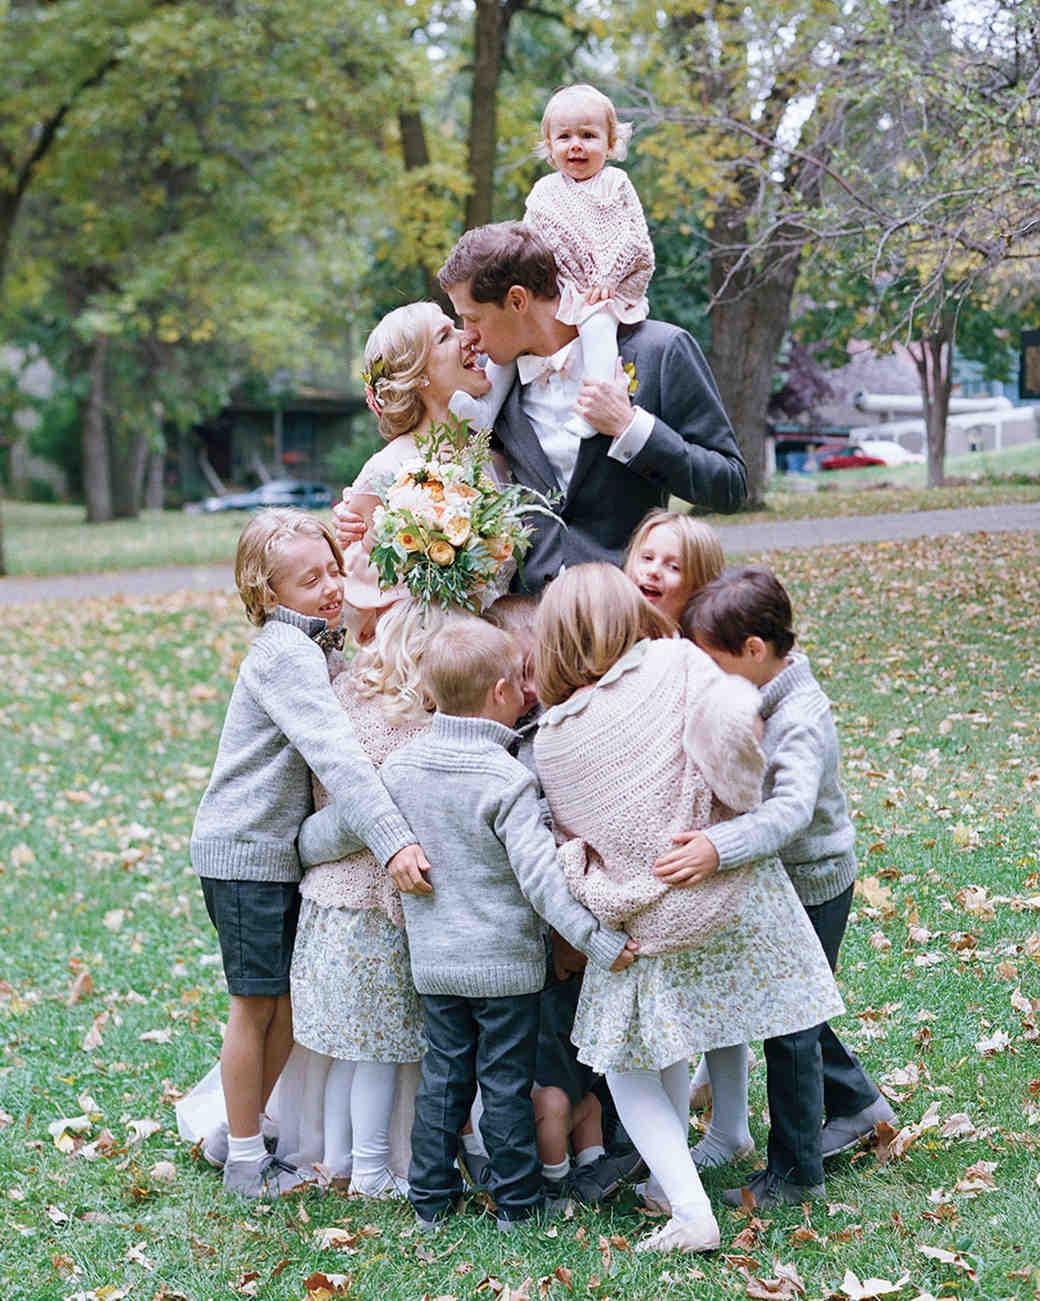 adrienne-jason-wedding-minnesota-group-hug-0323-s111925.jpg